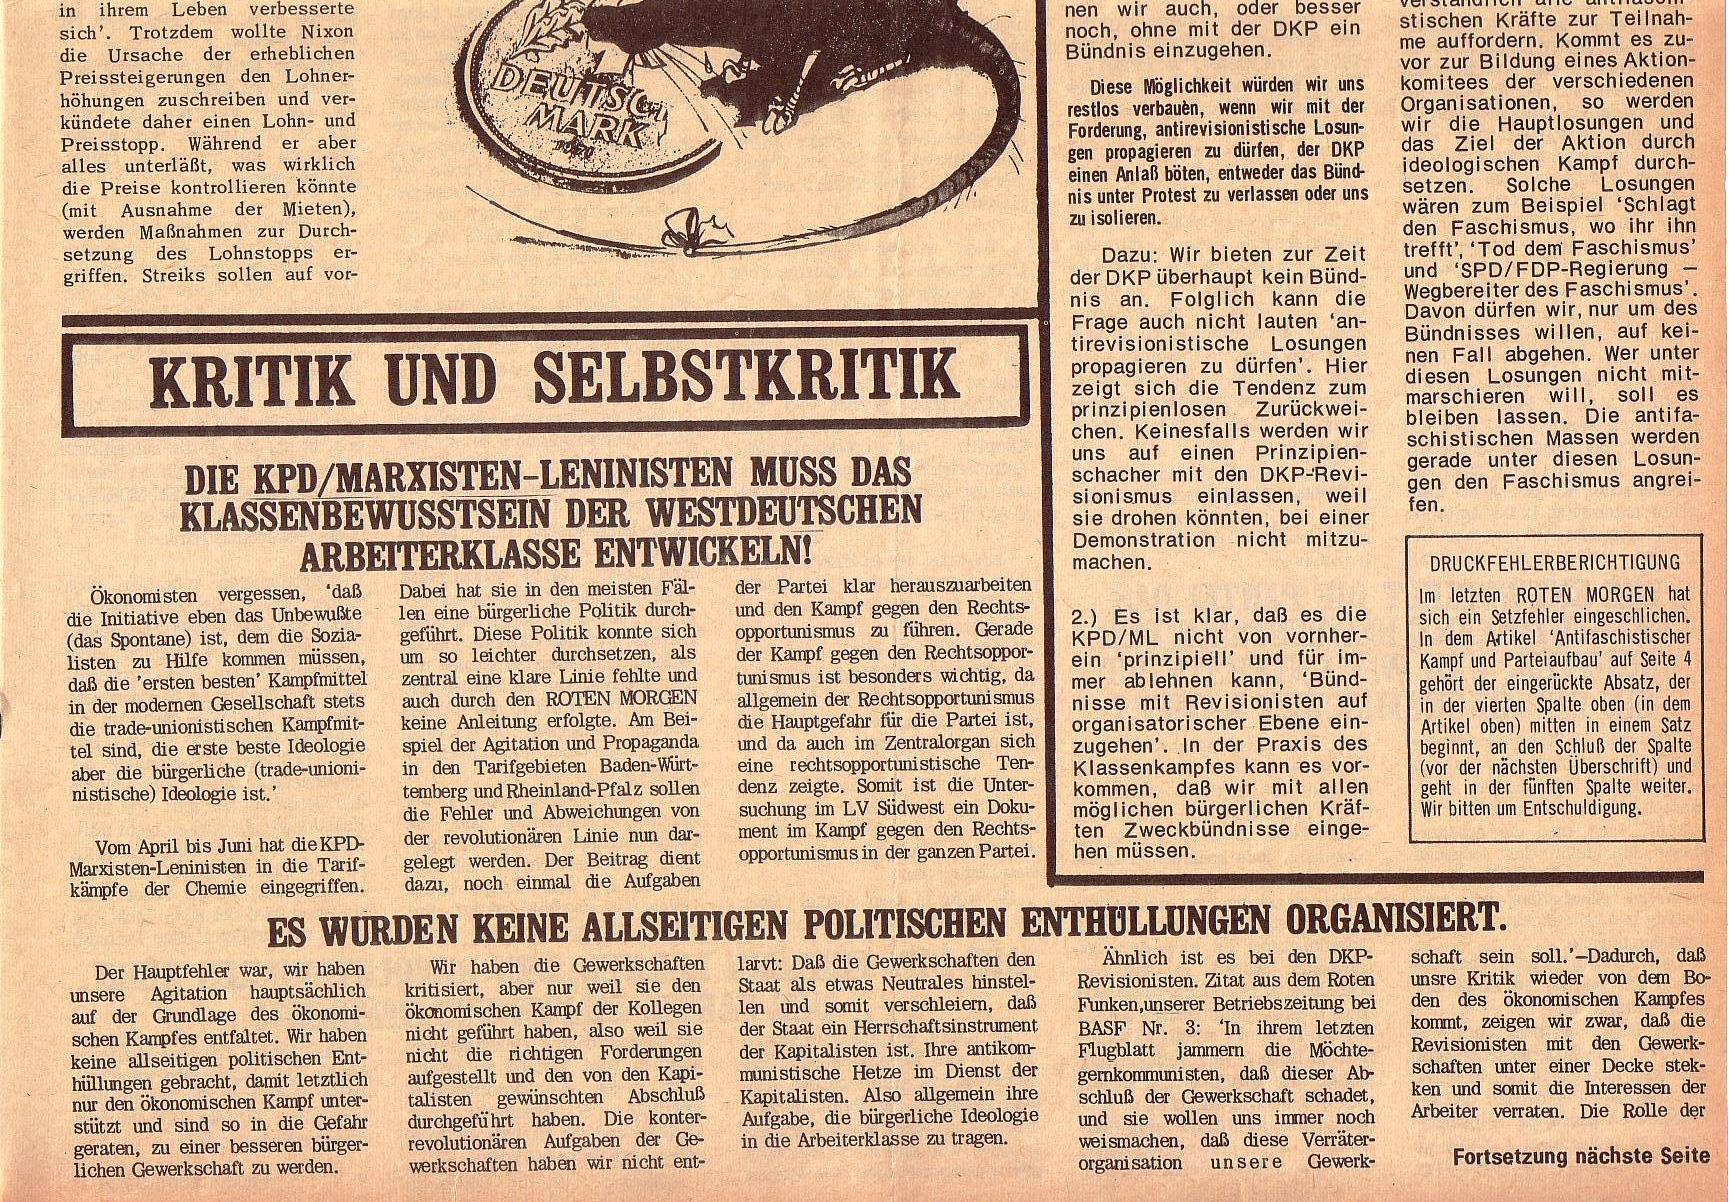 Roter Morgen, 5. Jg., 27. September 1971, Nr. 10, Seite 5b